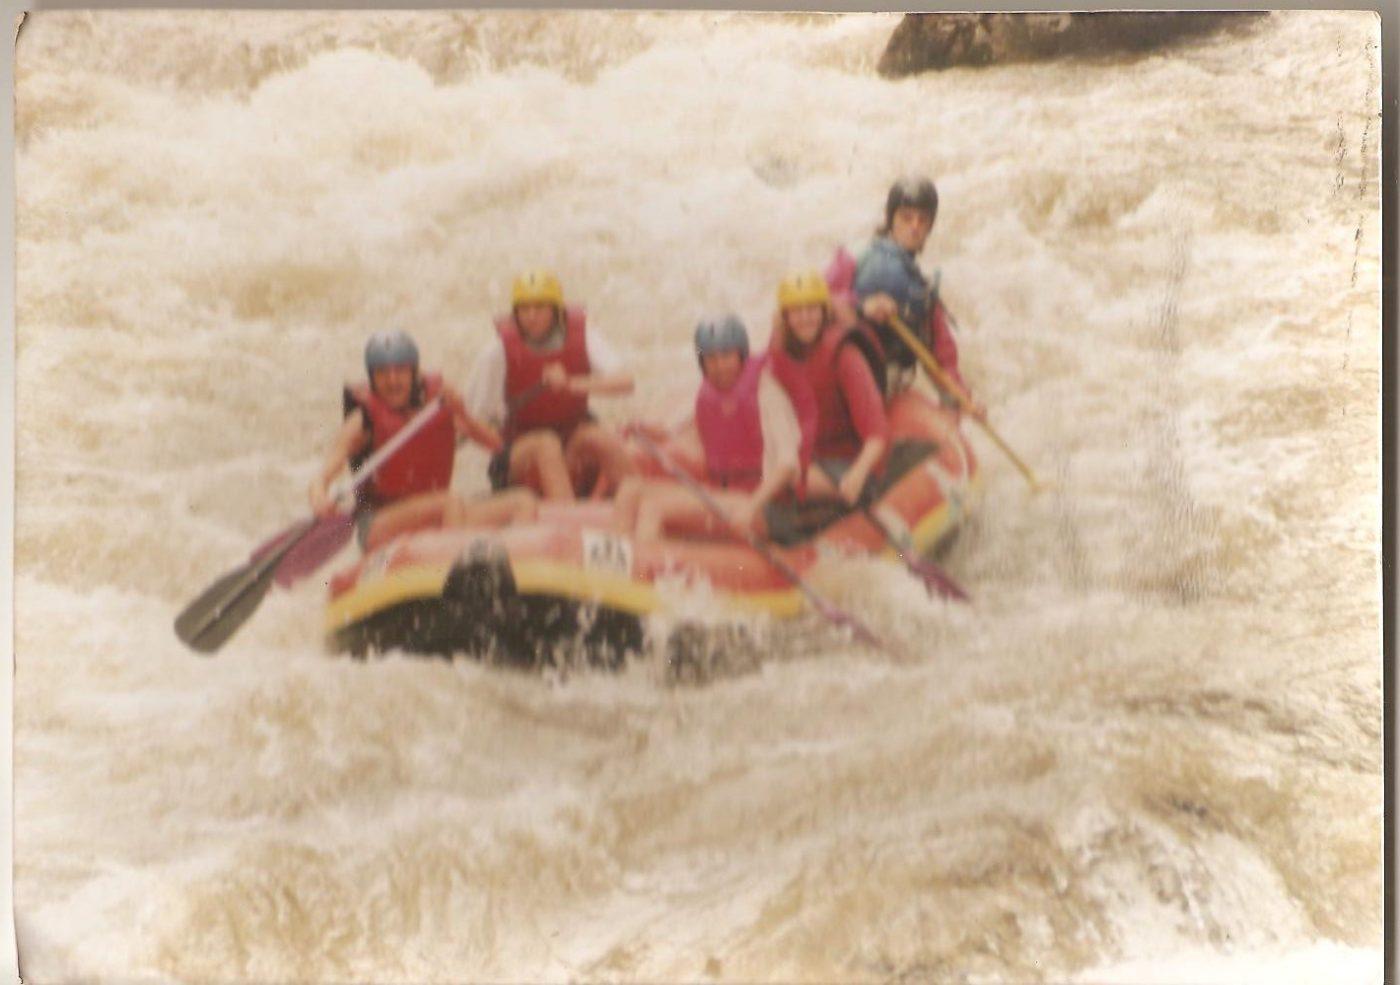 Rafting à l'ancienne